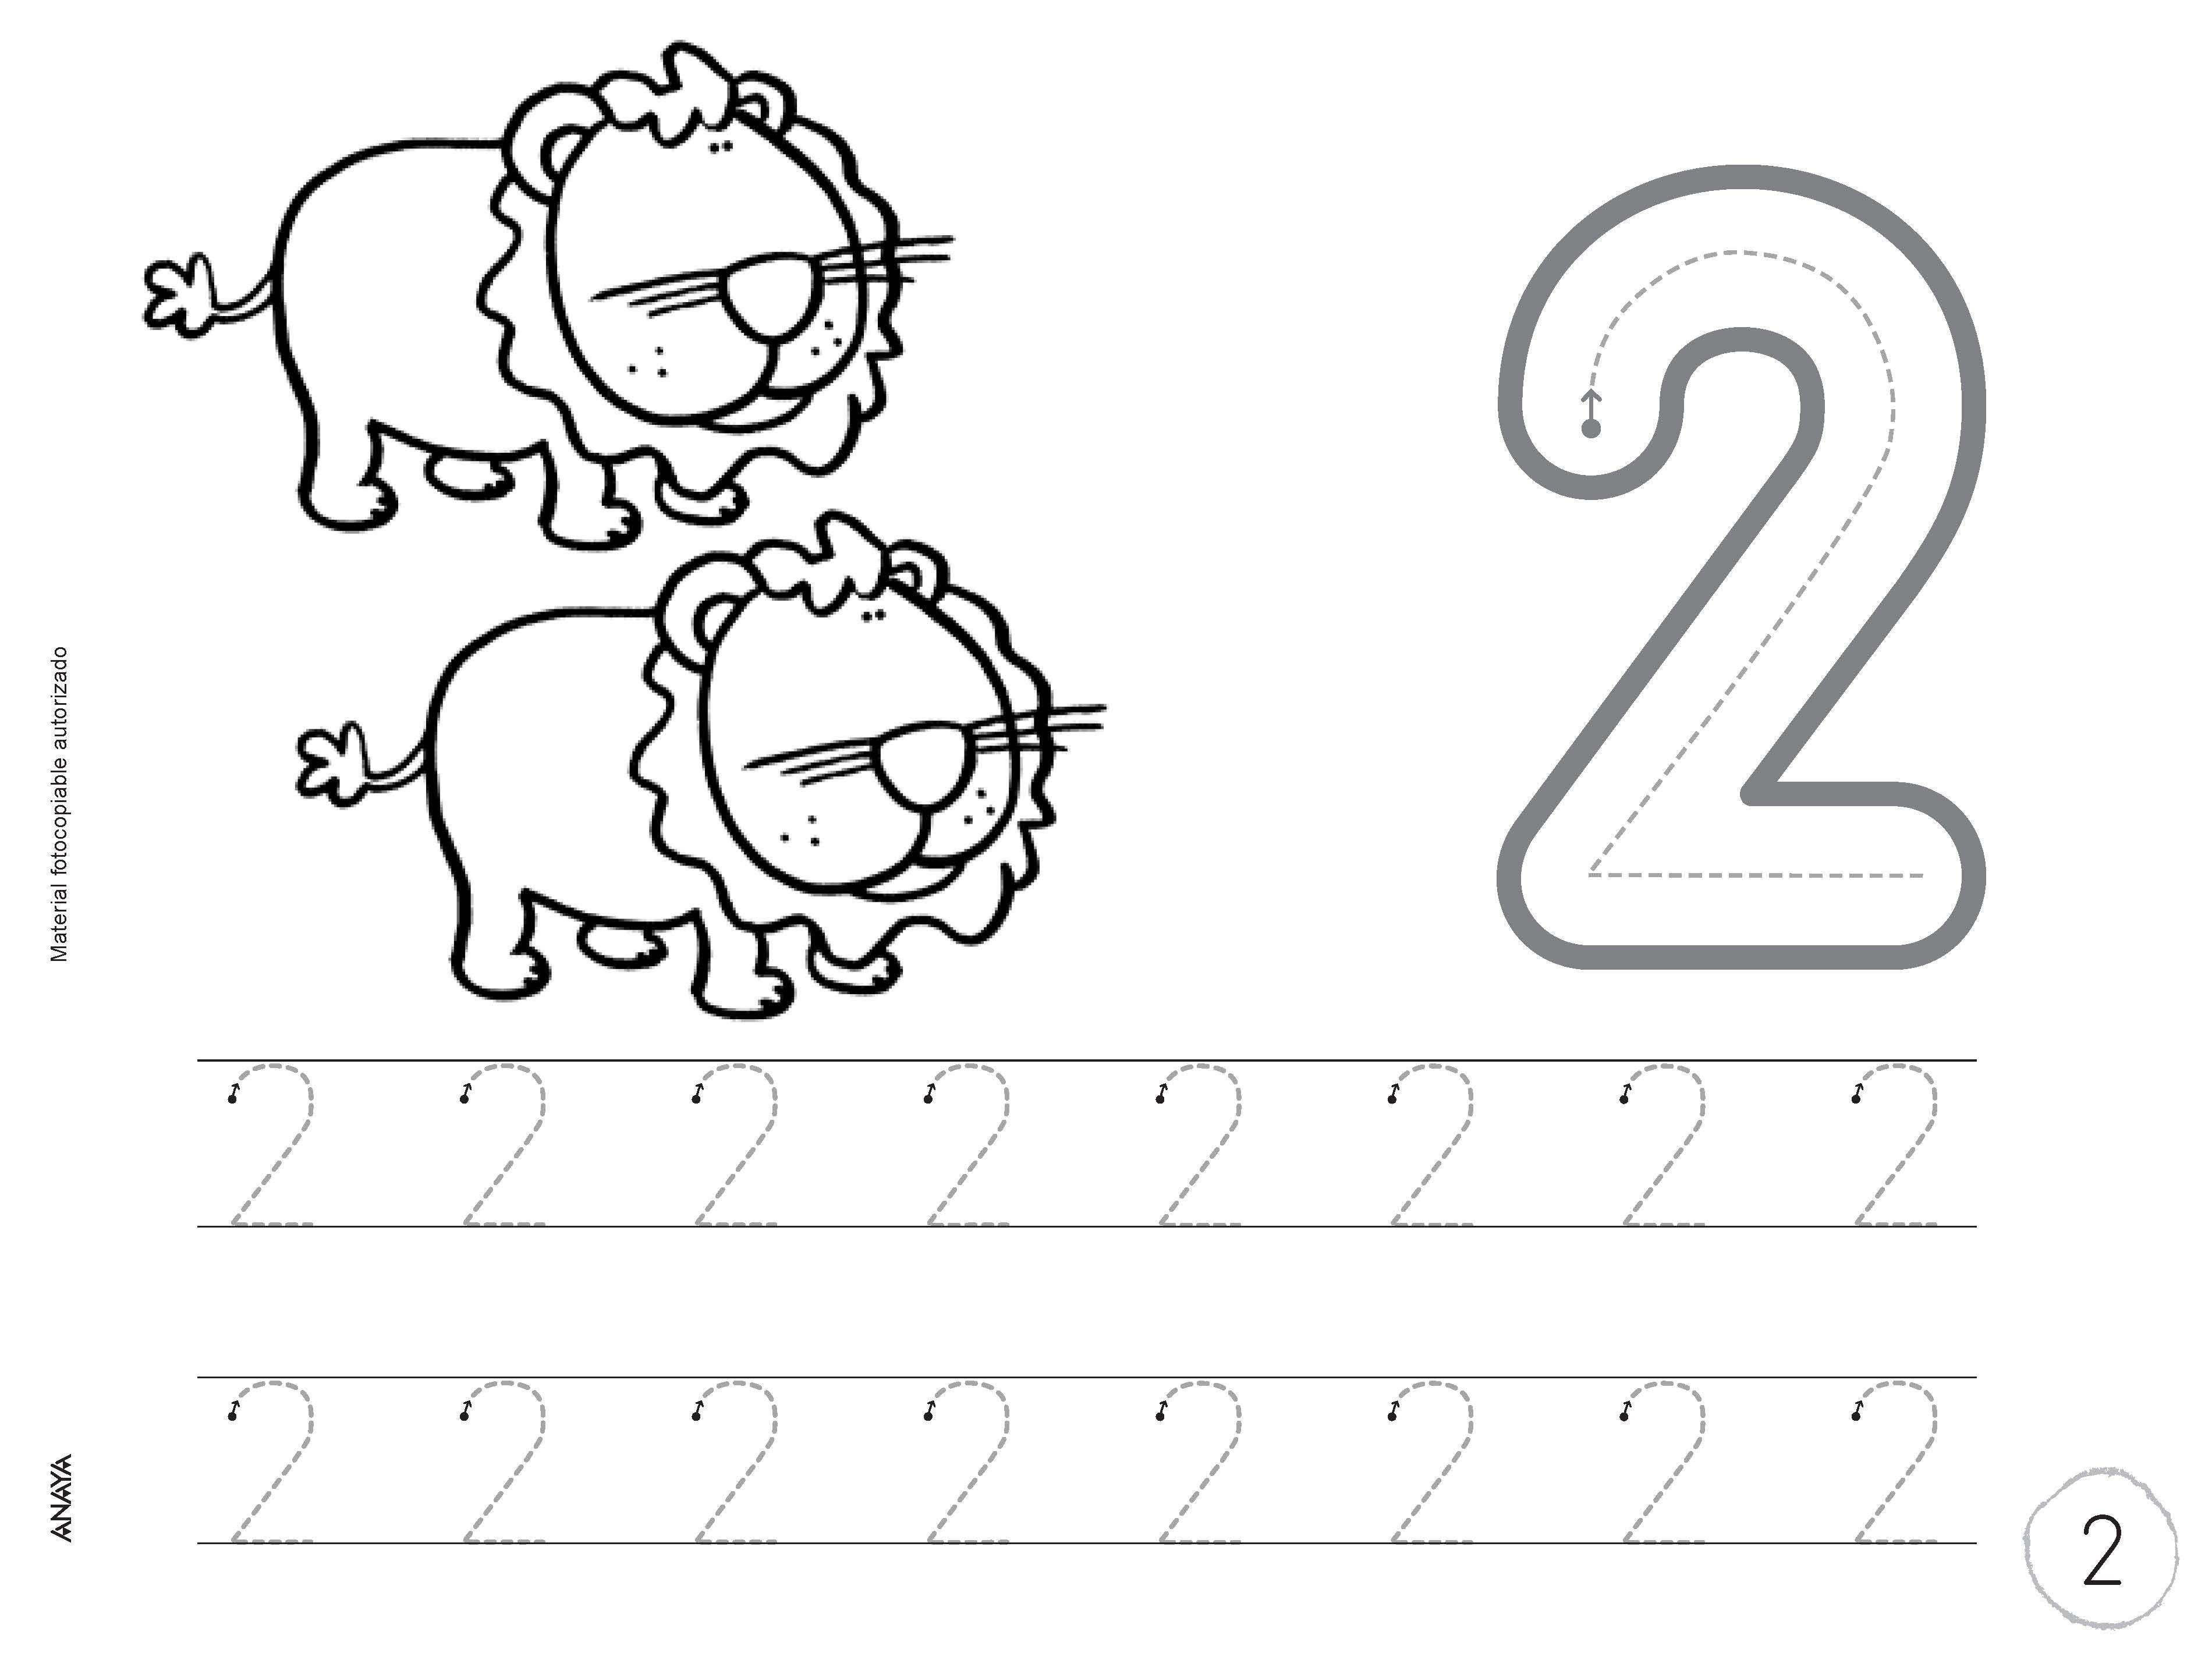 Fichas de ejercicios de refuerzo para ni os de 3 a os for Laminas infantiles para imprimir